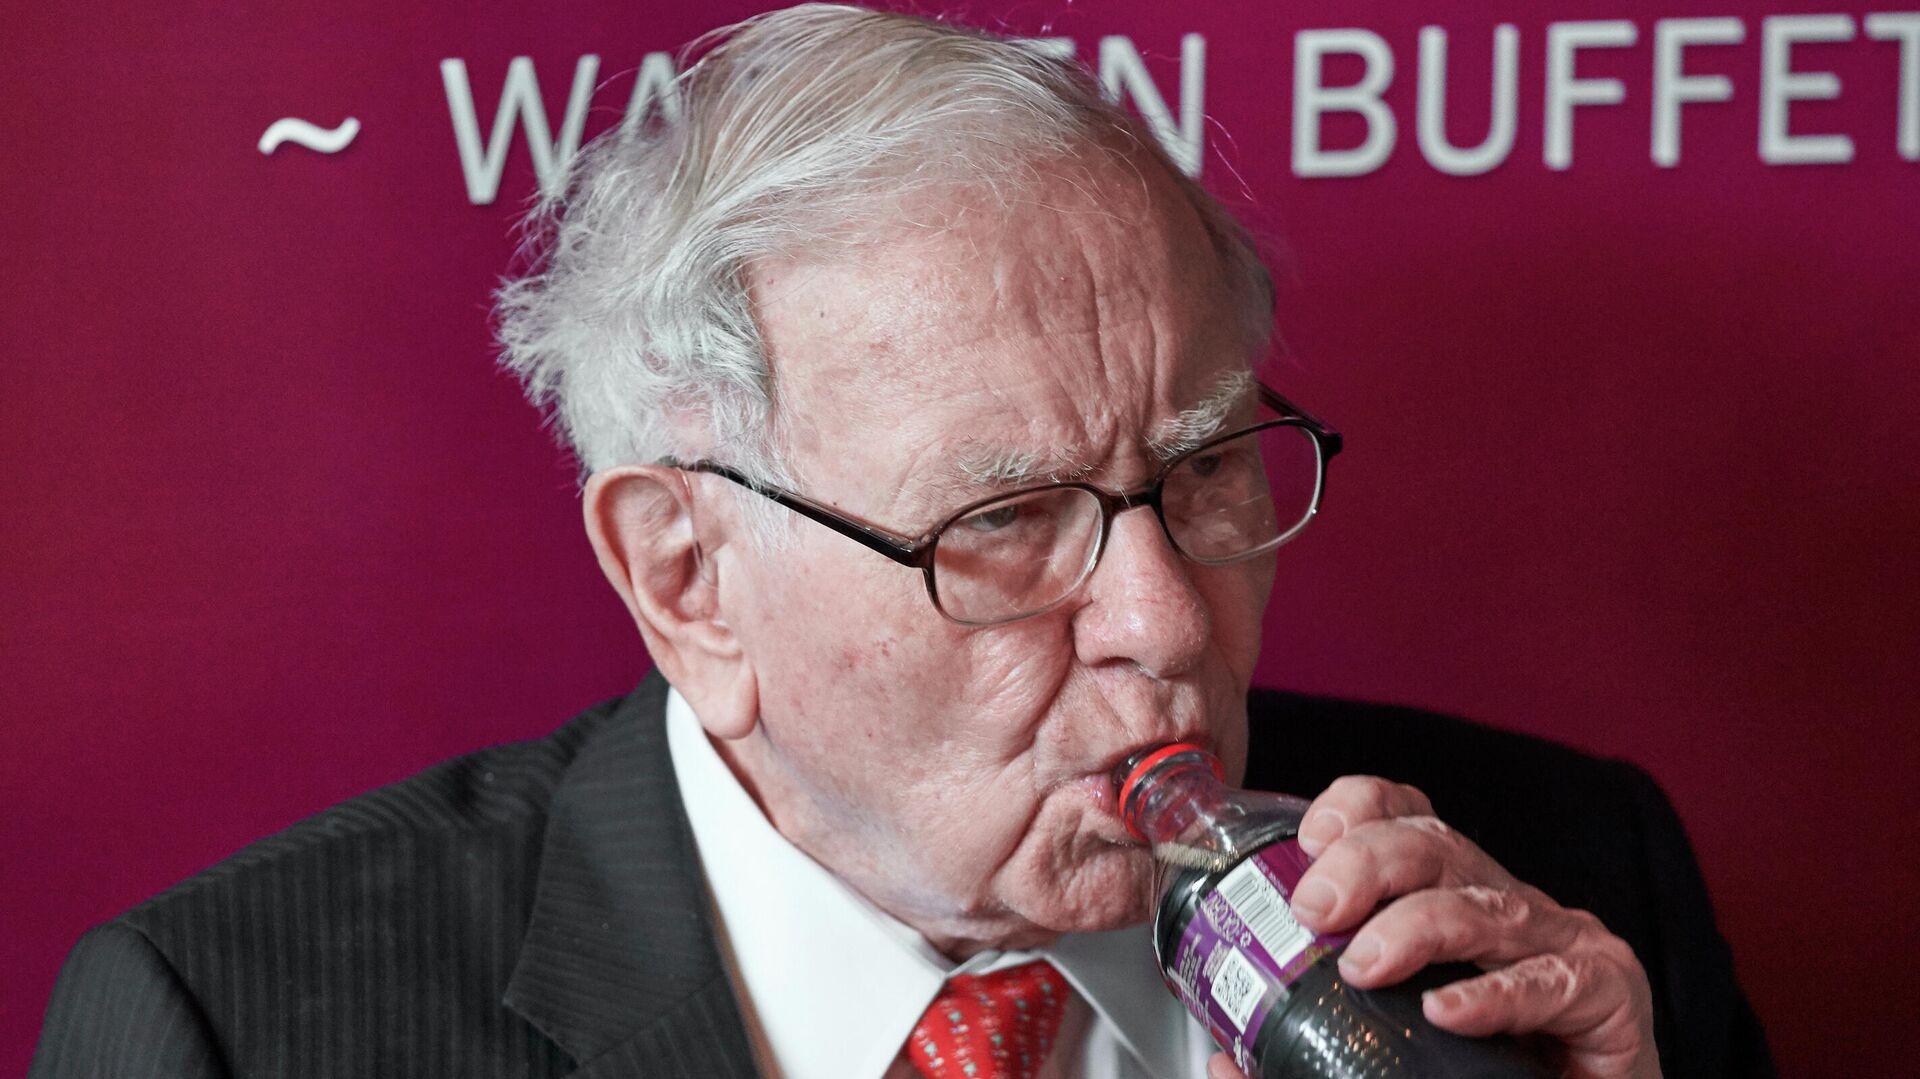 El inversor Warren Buffett, disfrutando de una Coca-Cola en 2019 - Sputnik Mundo, 1920, 24.07.2021